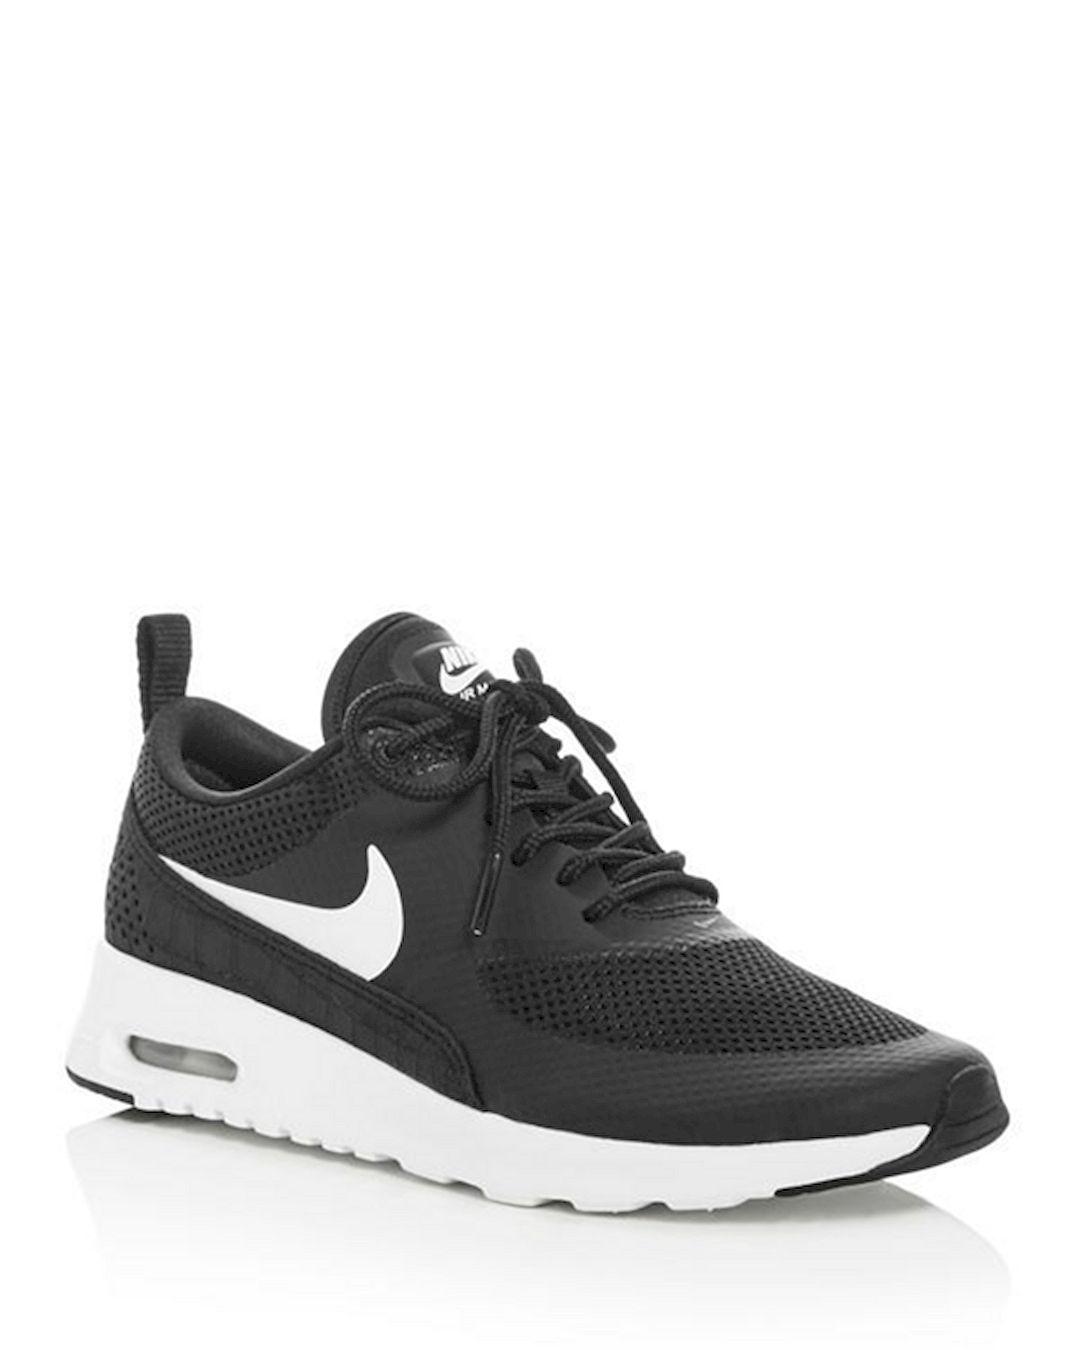 8850e3e47b5935 Air Max Day 2017  The Best 221 Best Nike Designs https   www